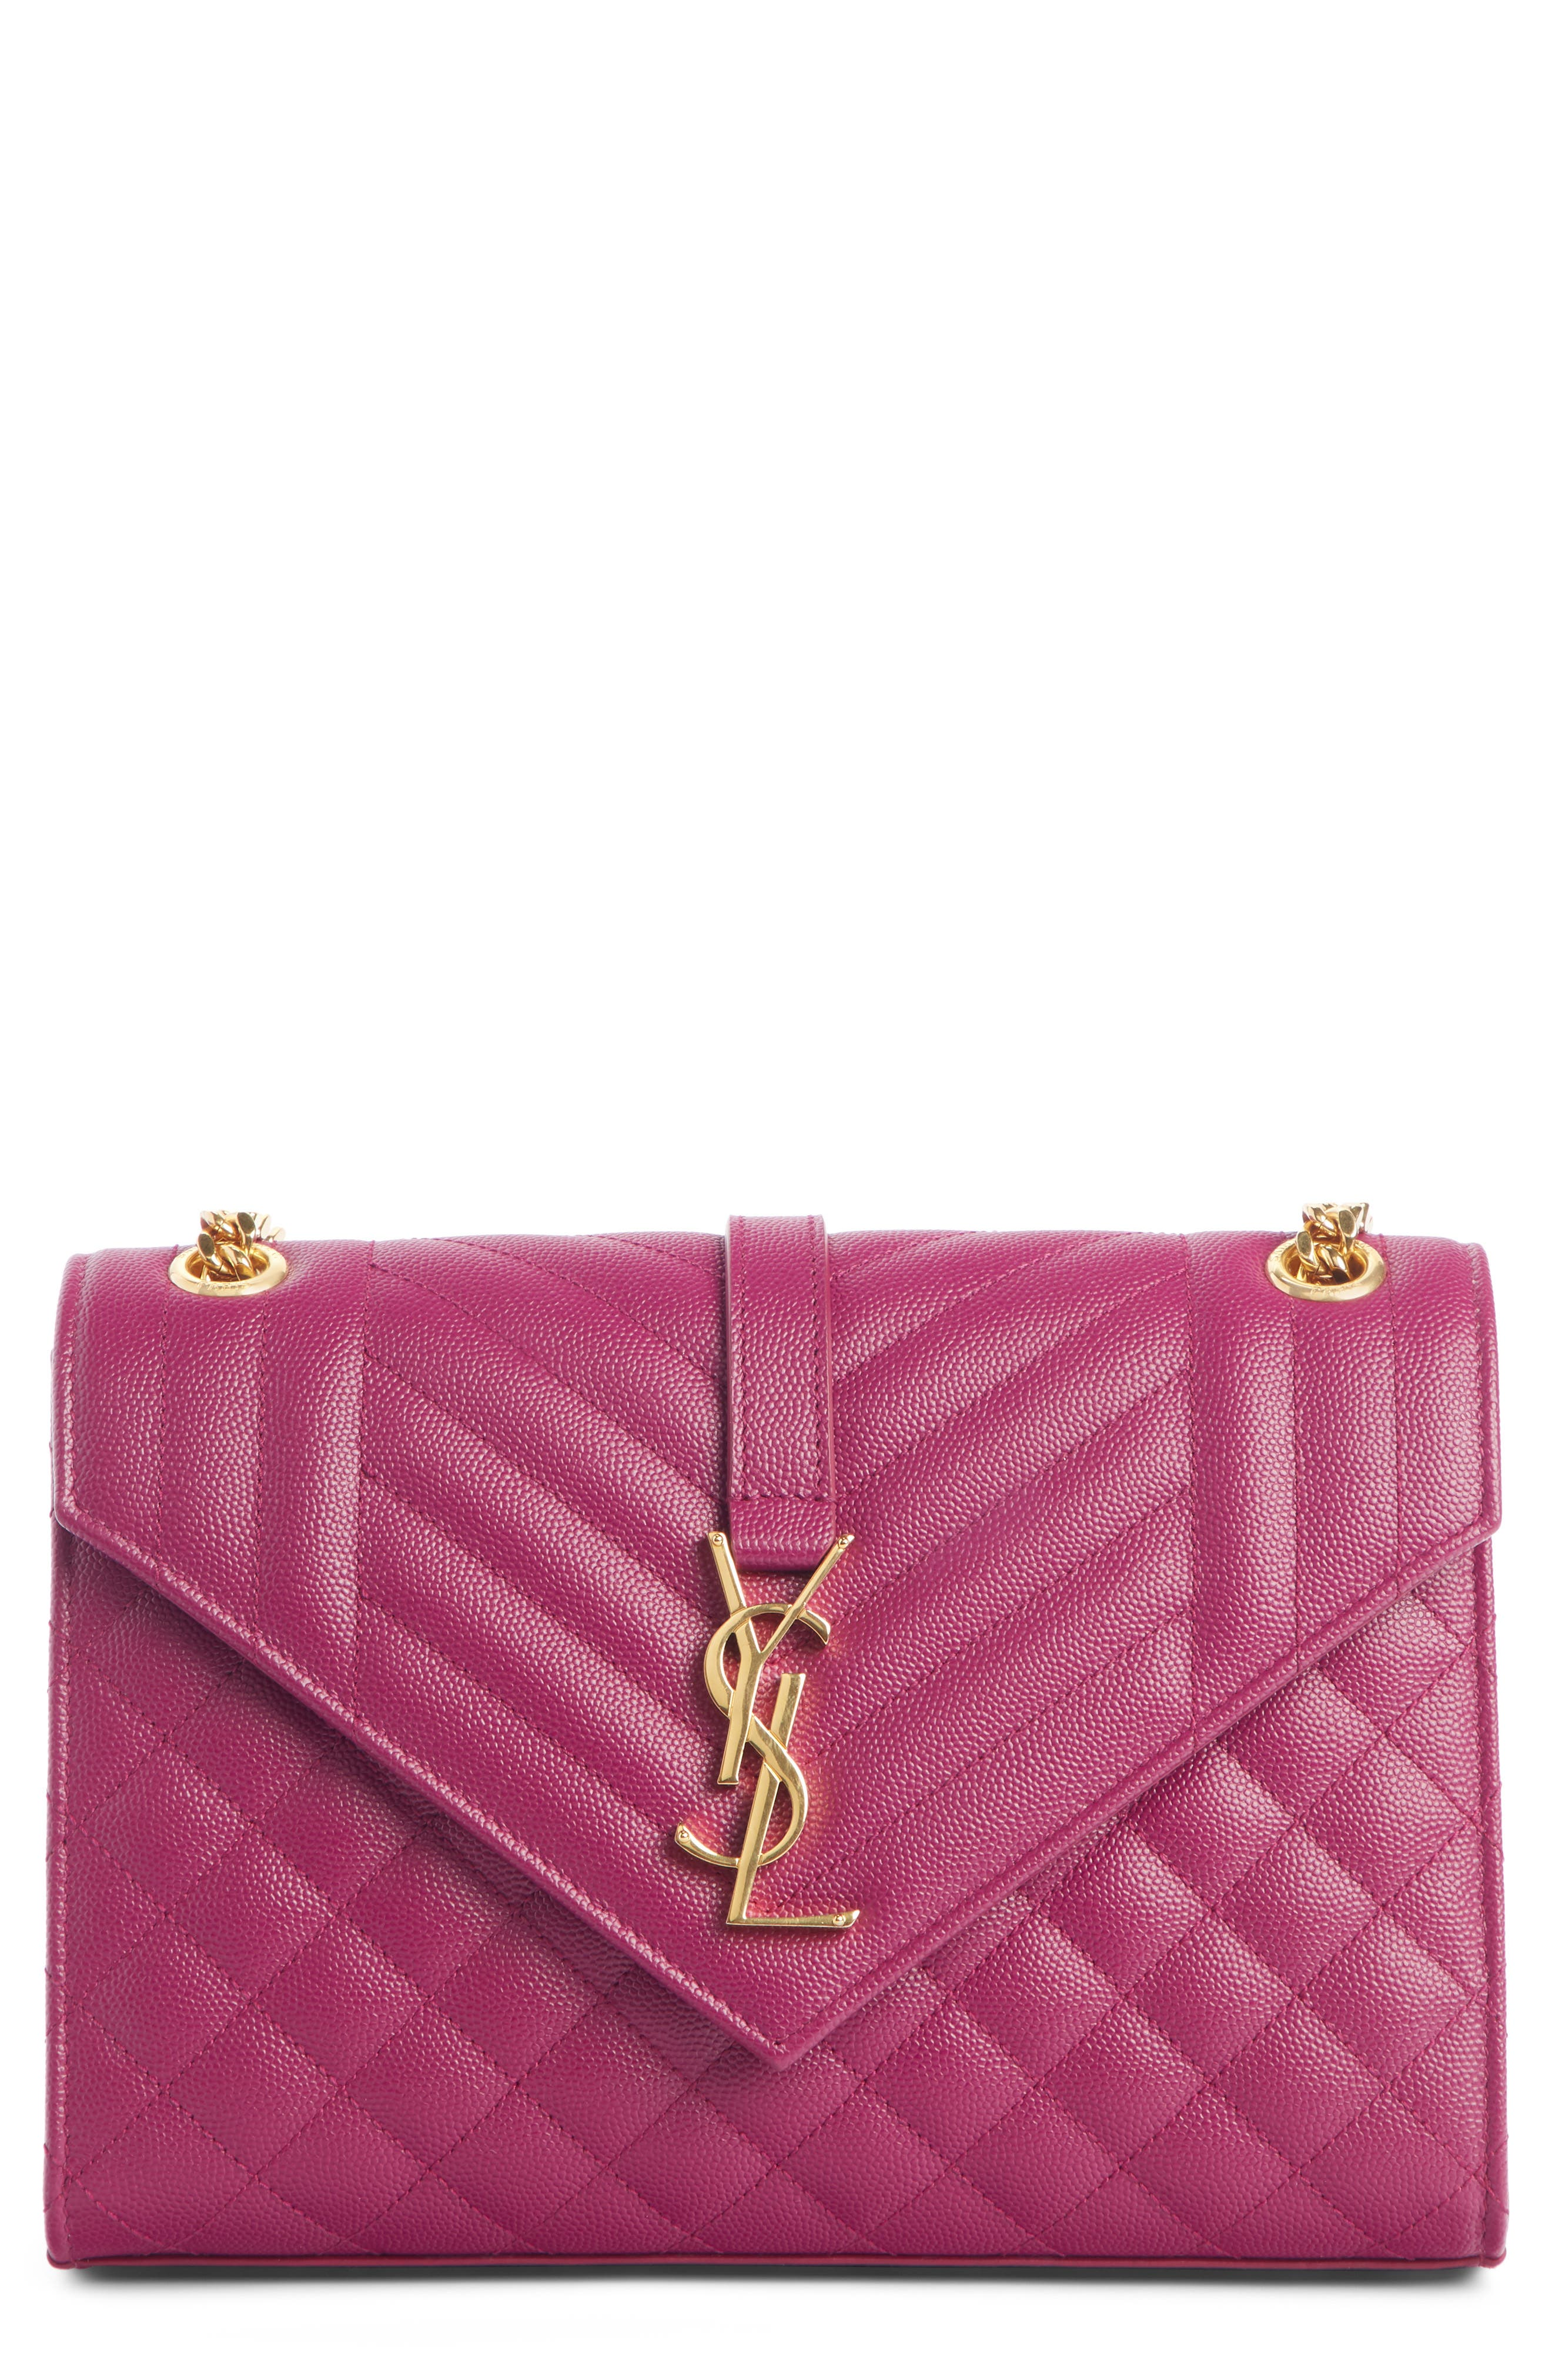 SAINT LAURENT Medium Cassandre Calfskin Shoulder Bag, Main, color, DARK GRAPE